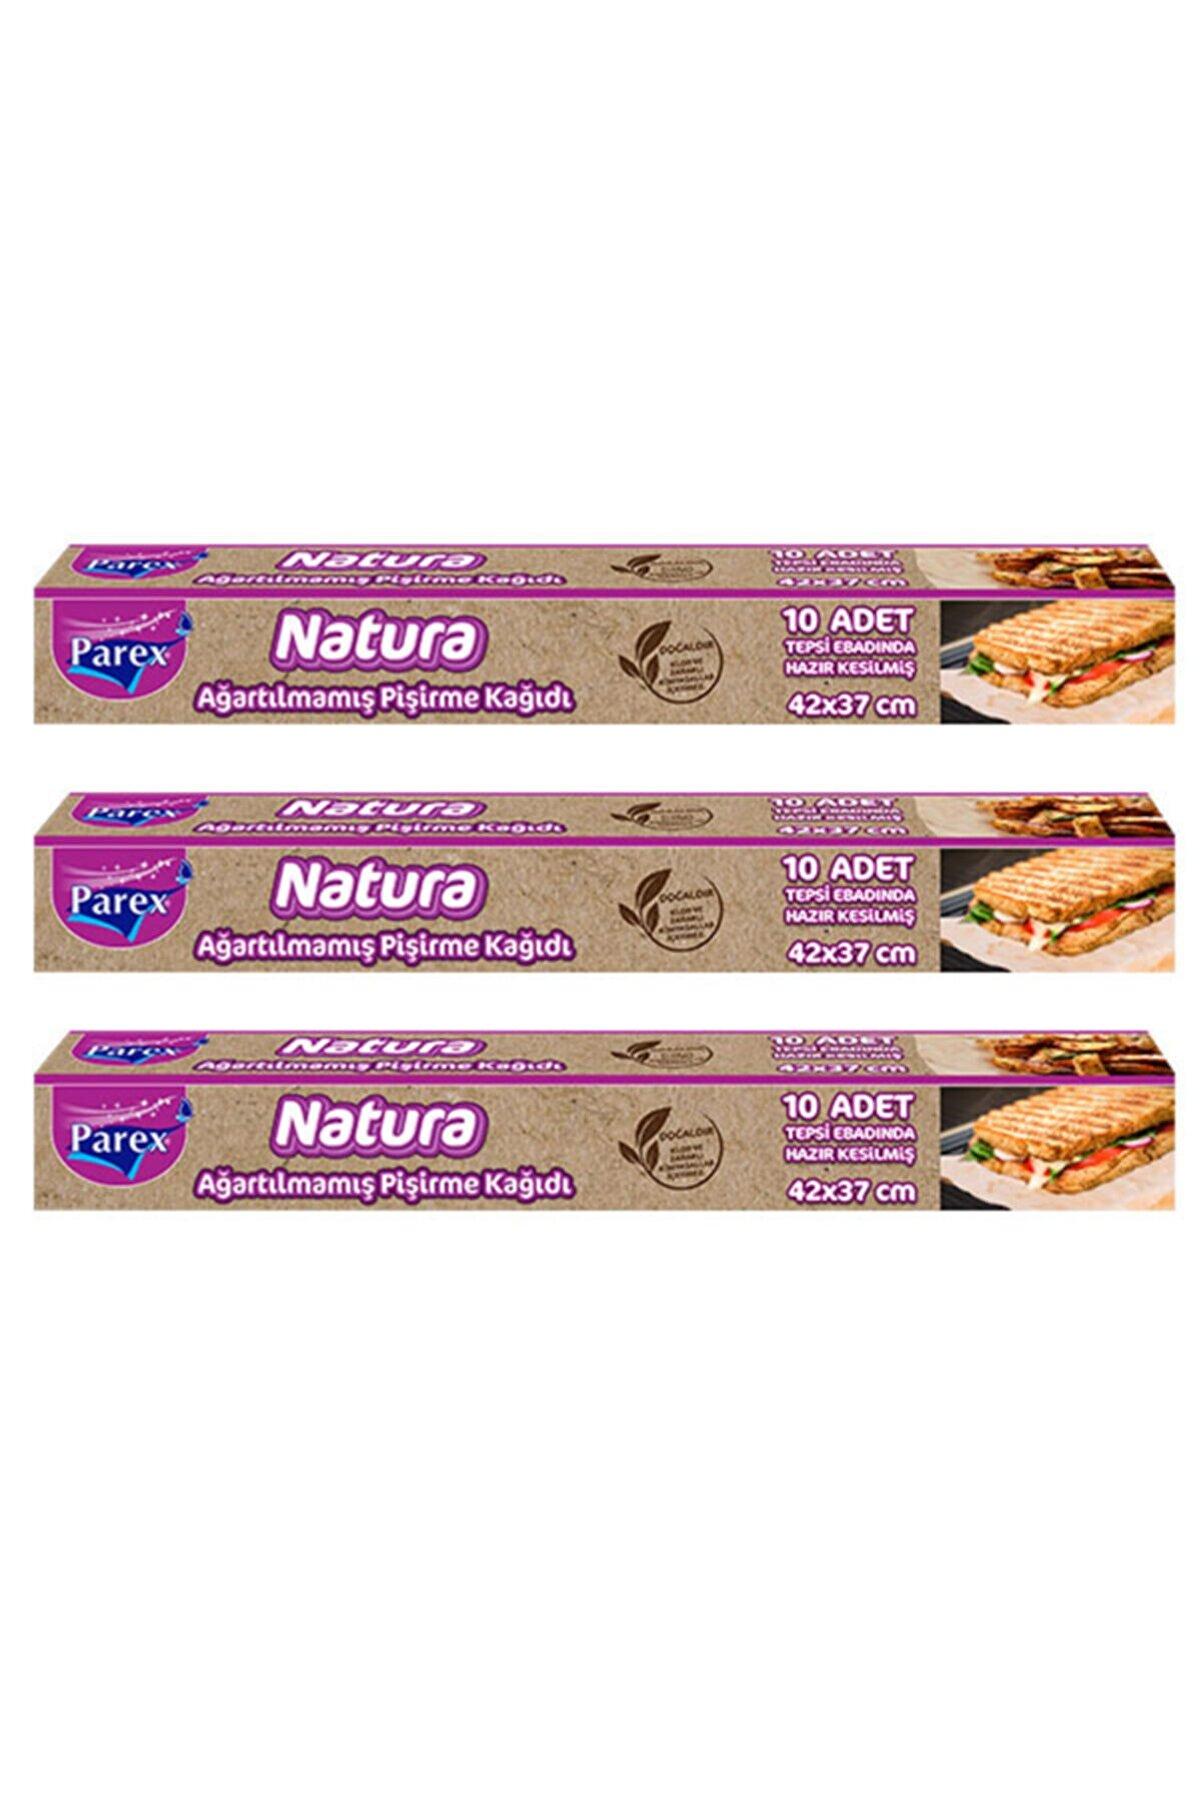 Parex Natura 3 Adet Ağartılmamış Organik Hazır Kesilmiş Pişirme Kağıdı 10'lu